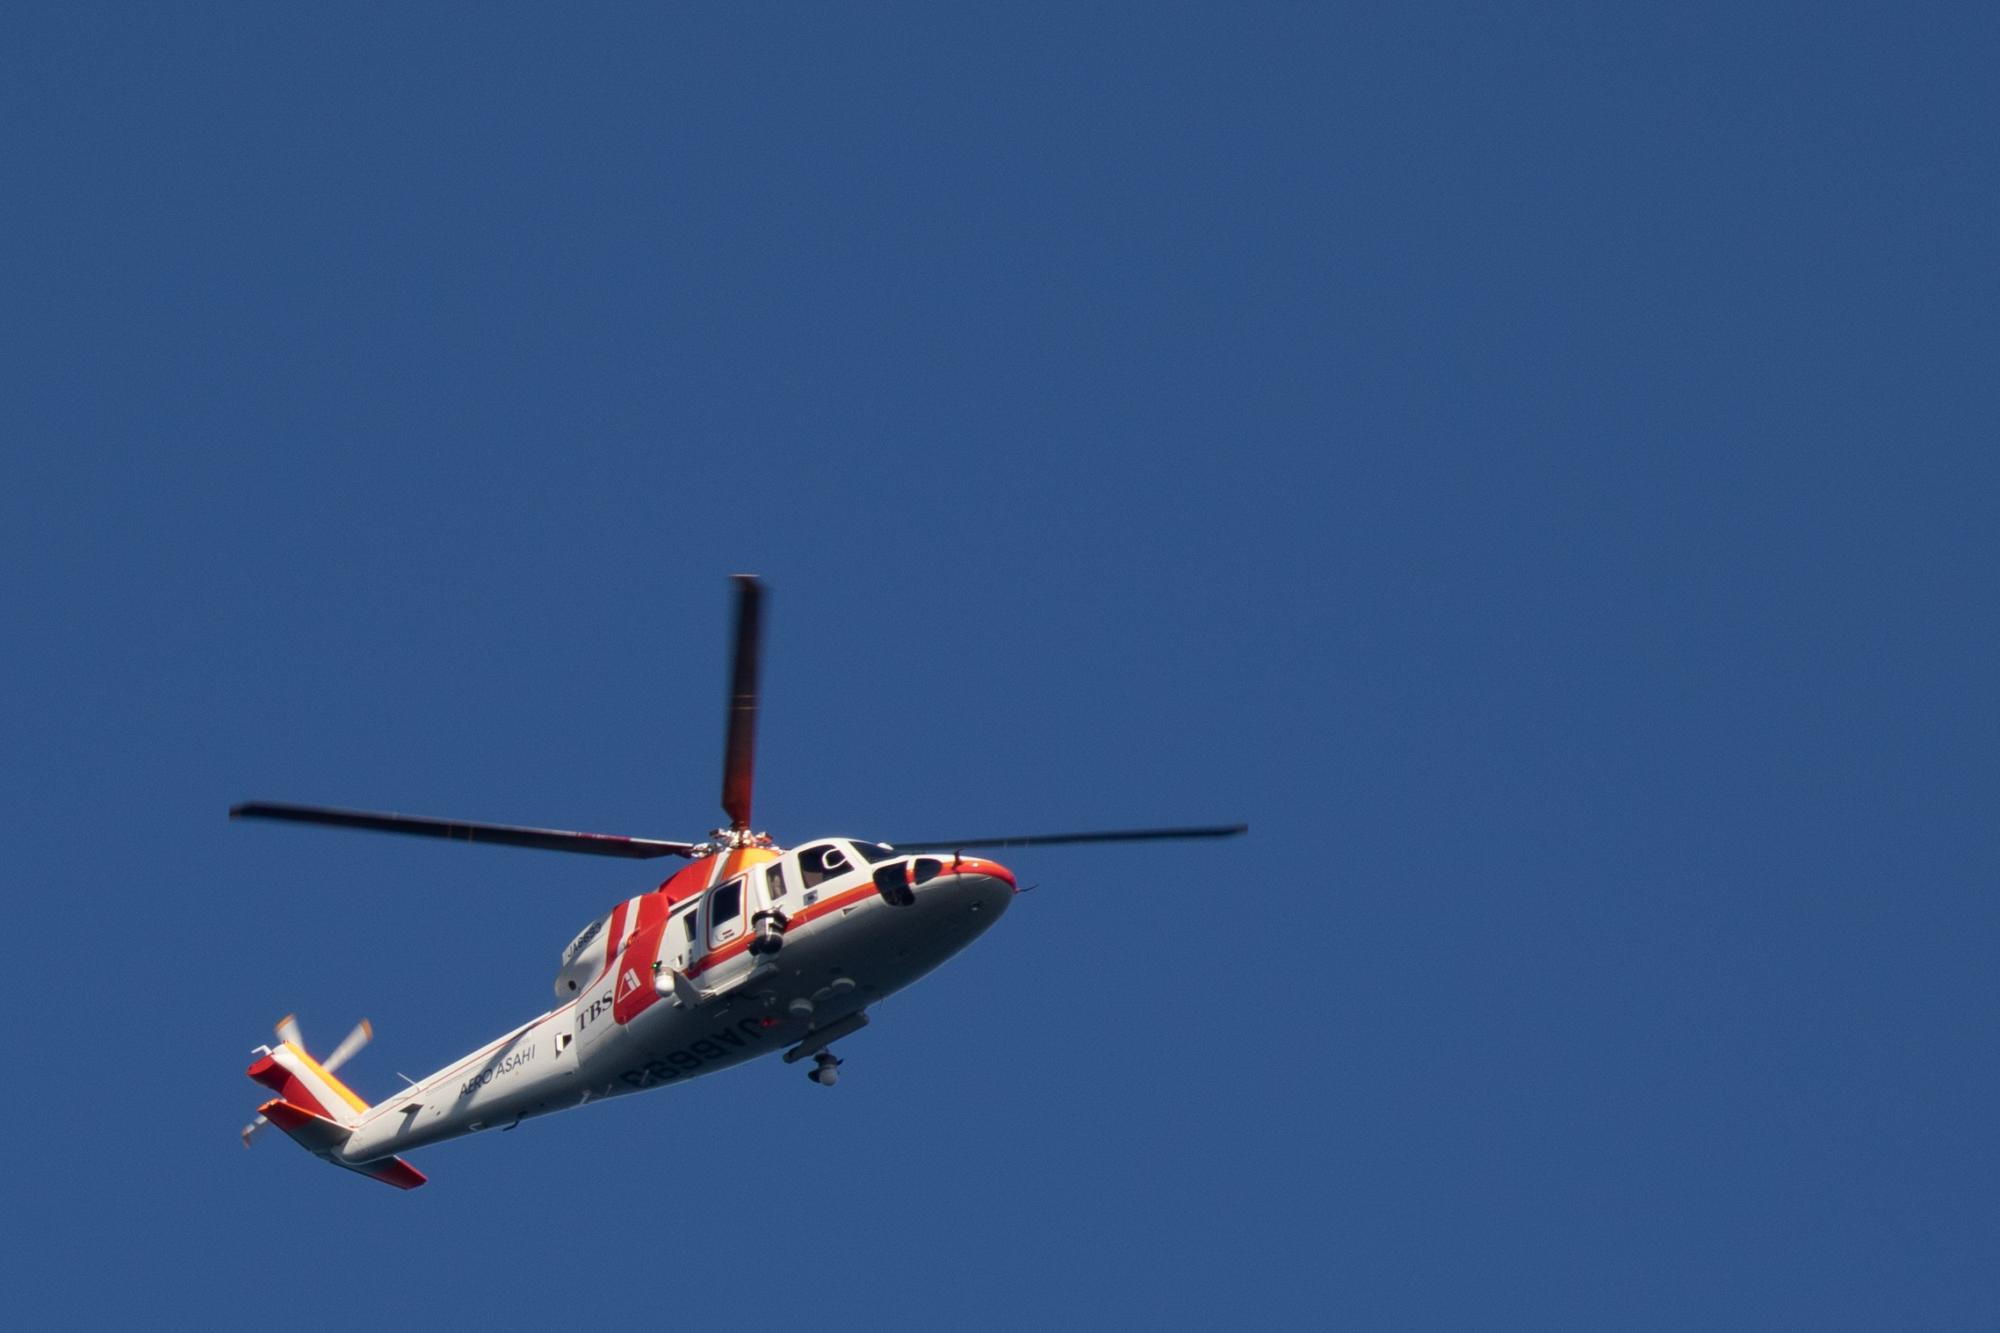 20191112-TBSヘリコプター